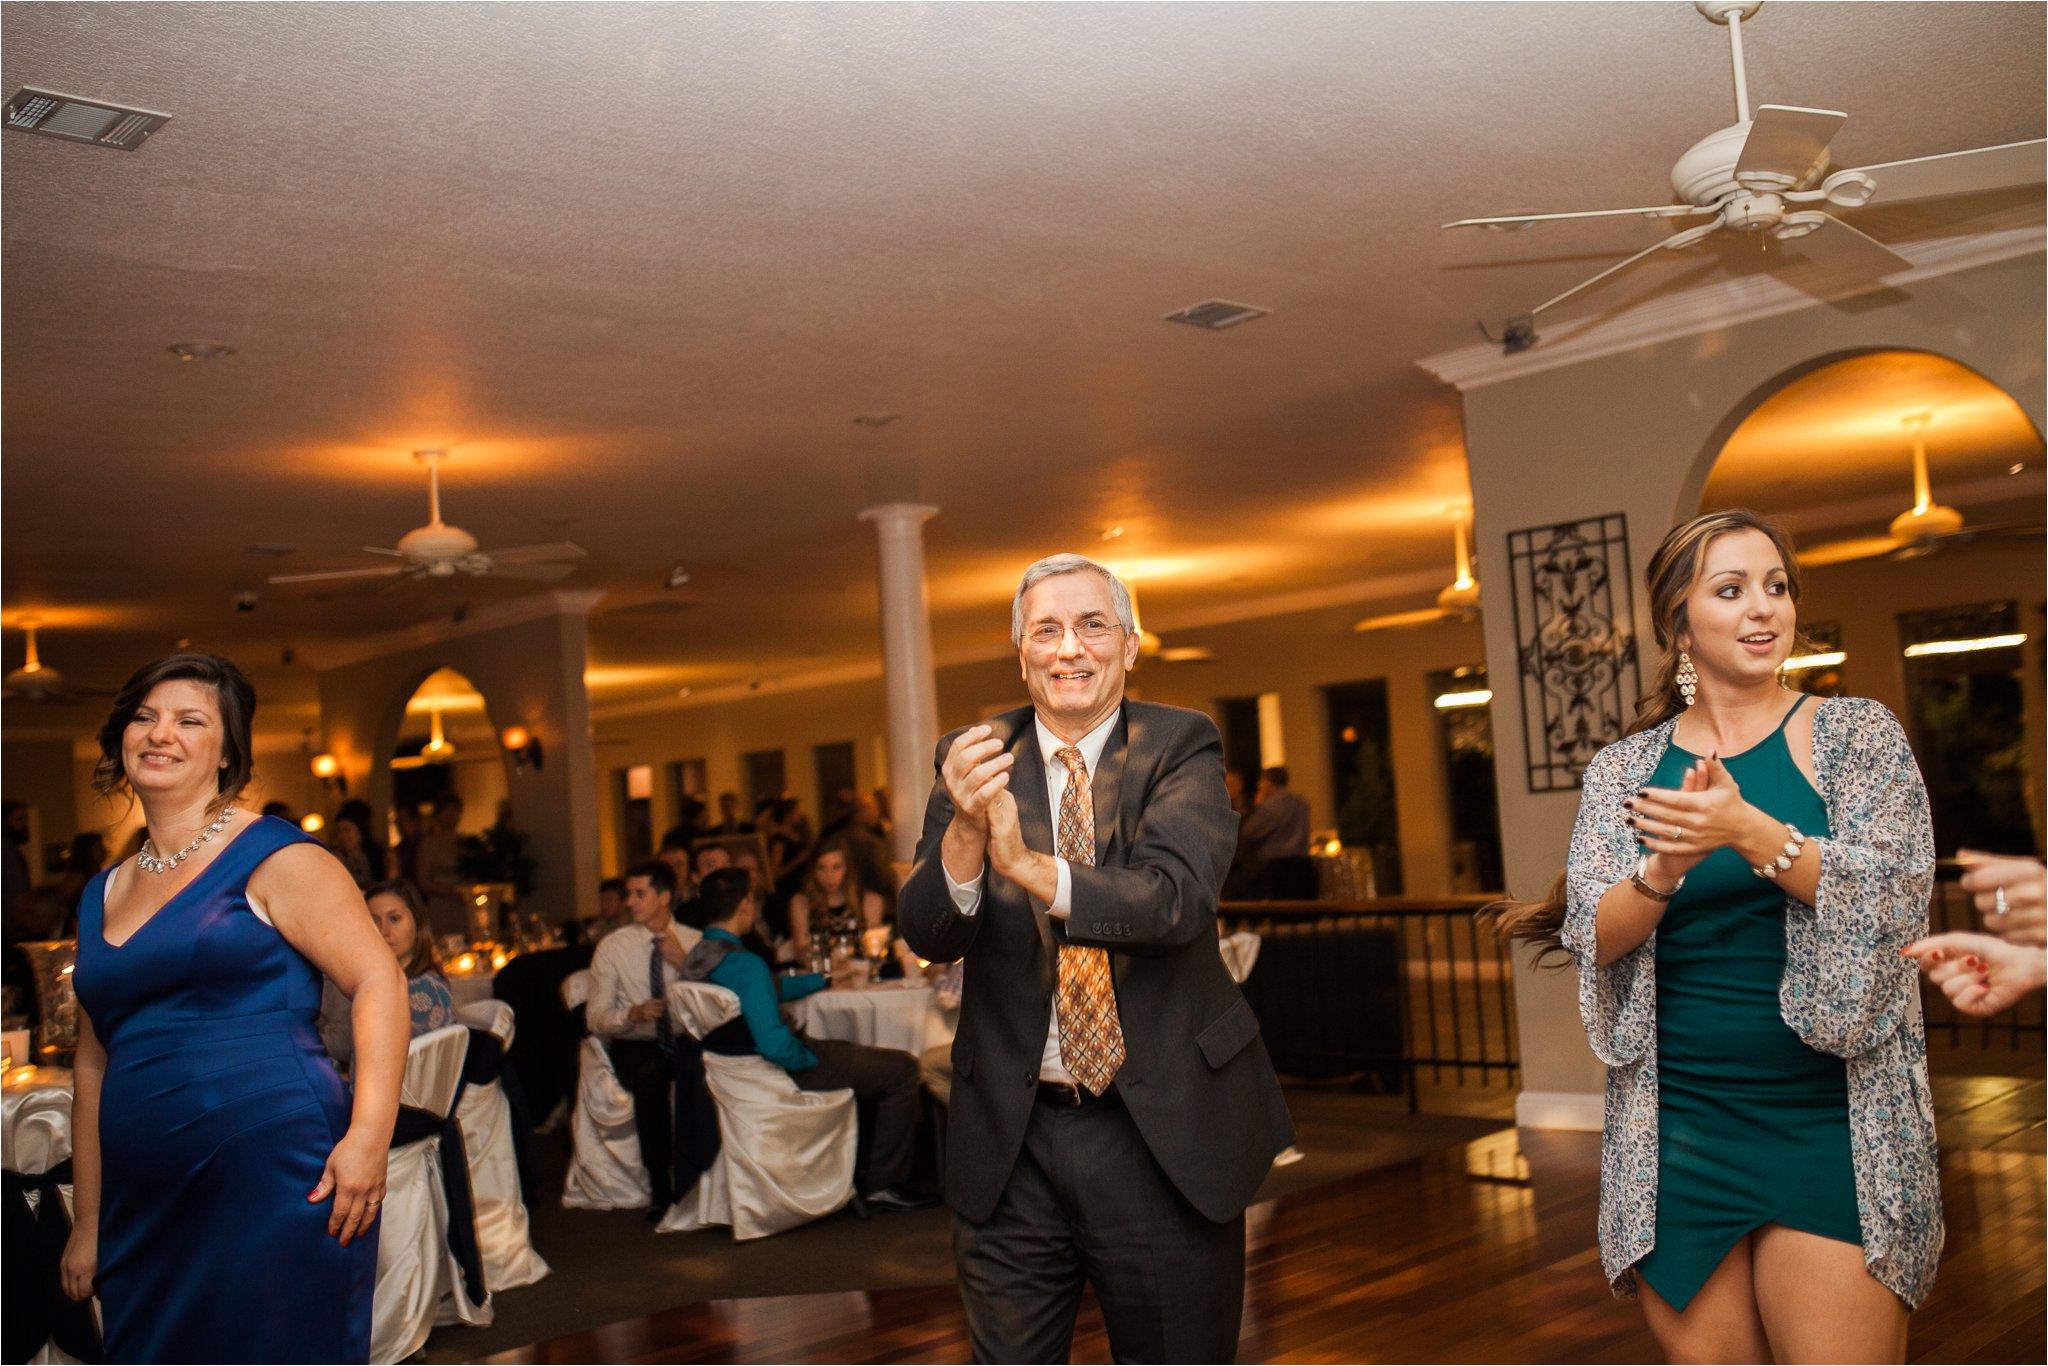 lunsford-wedding-1042.jpg